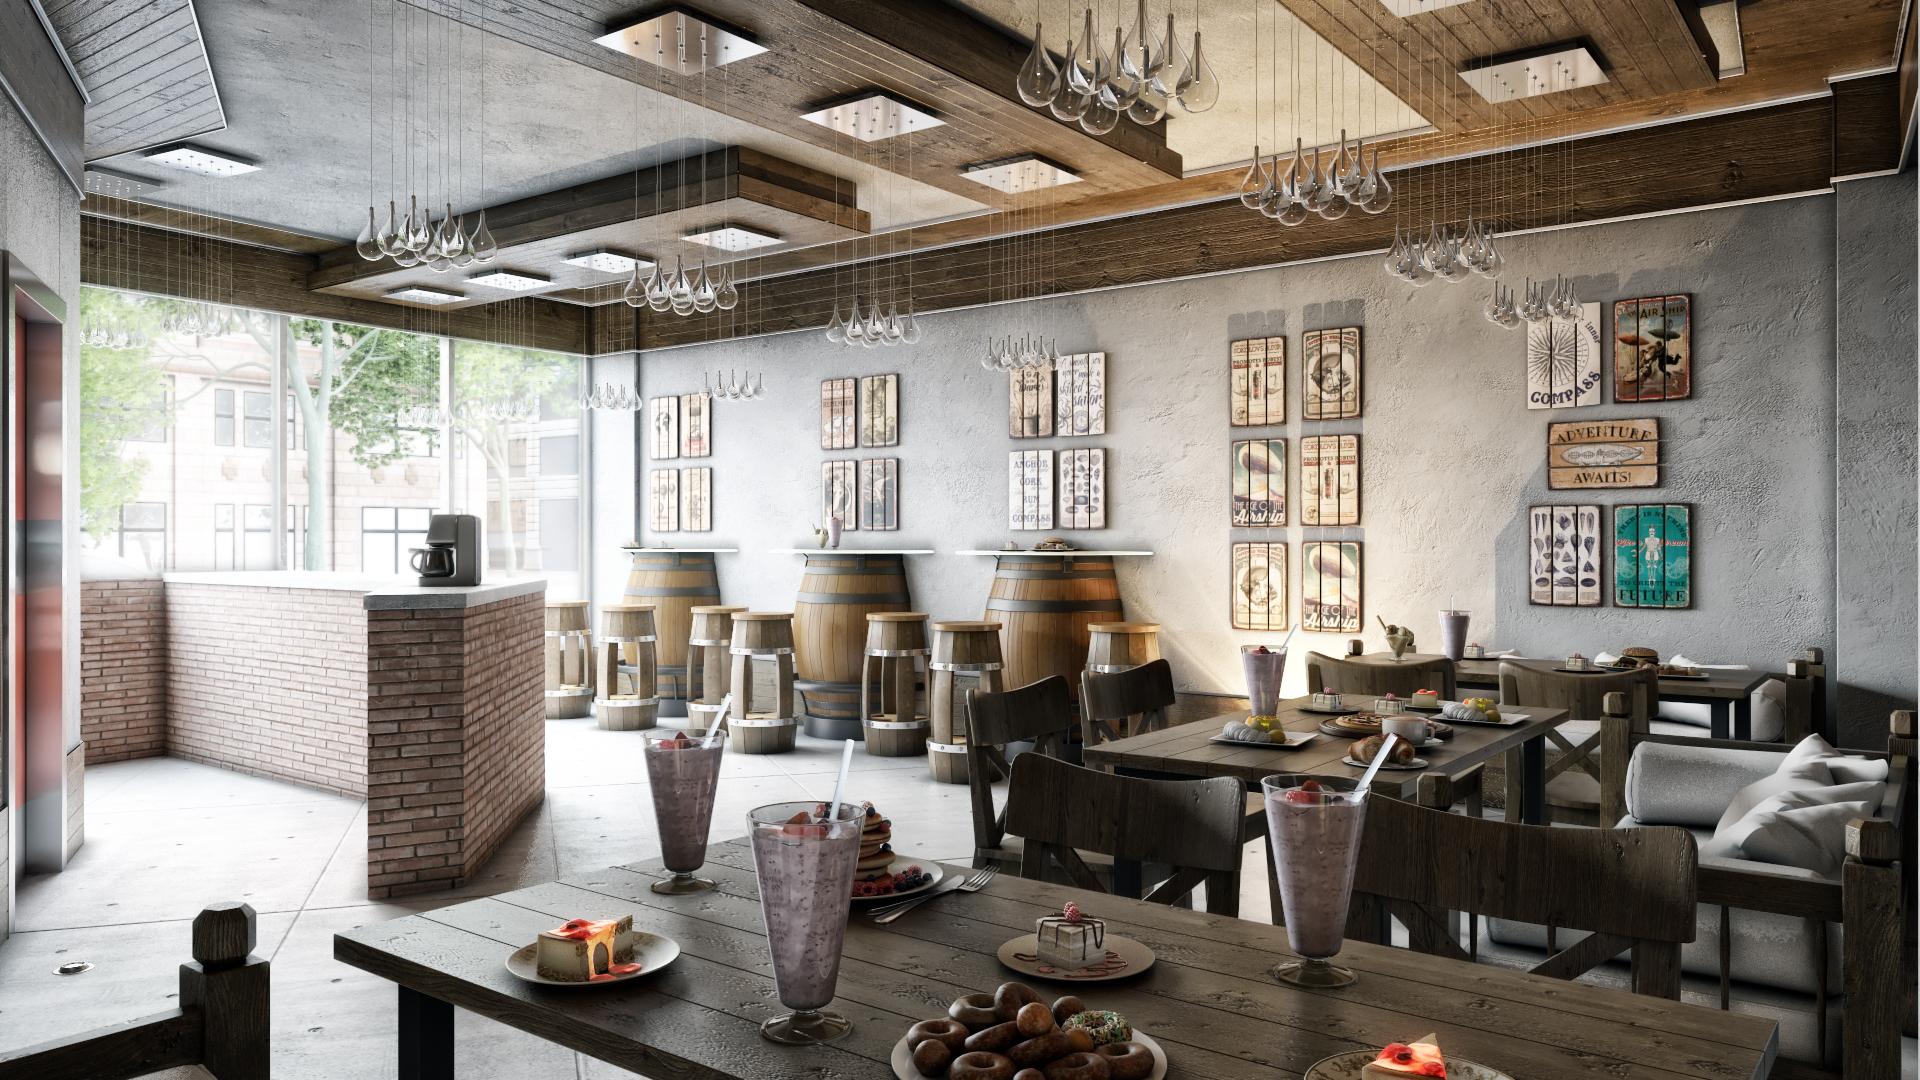 Drizzel Cafe Design Proposals, Kuwait